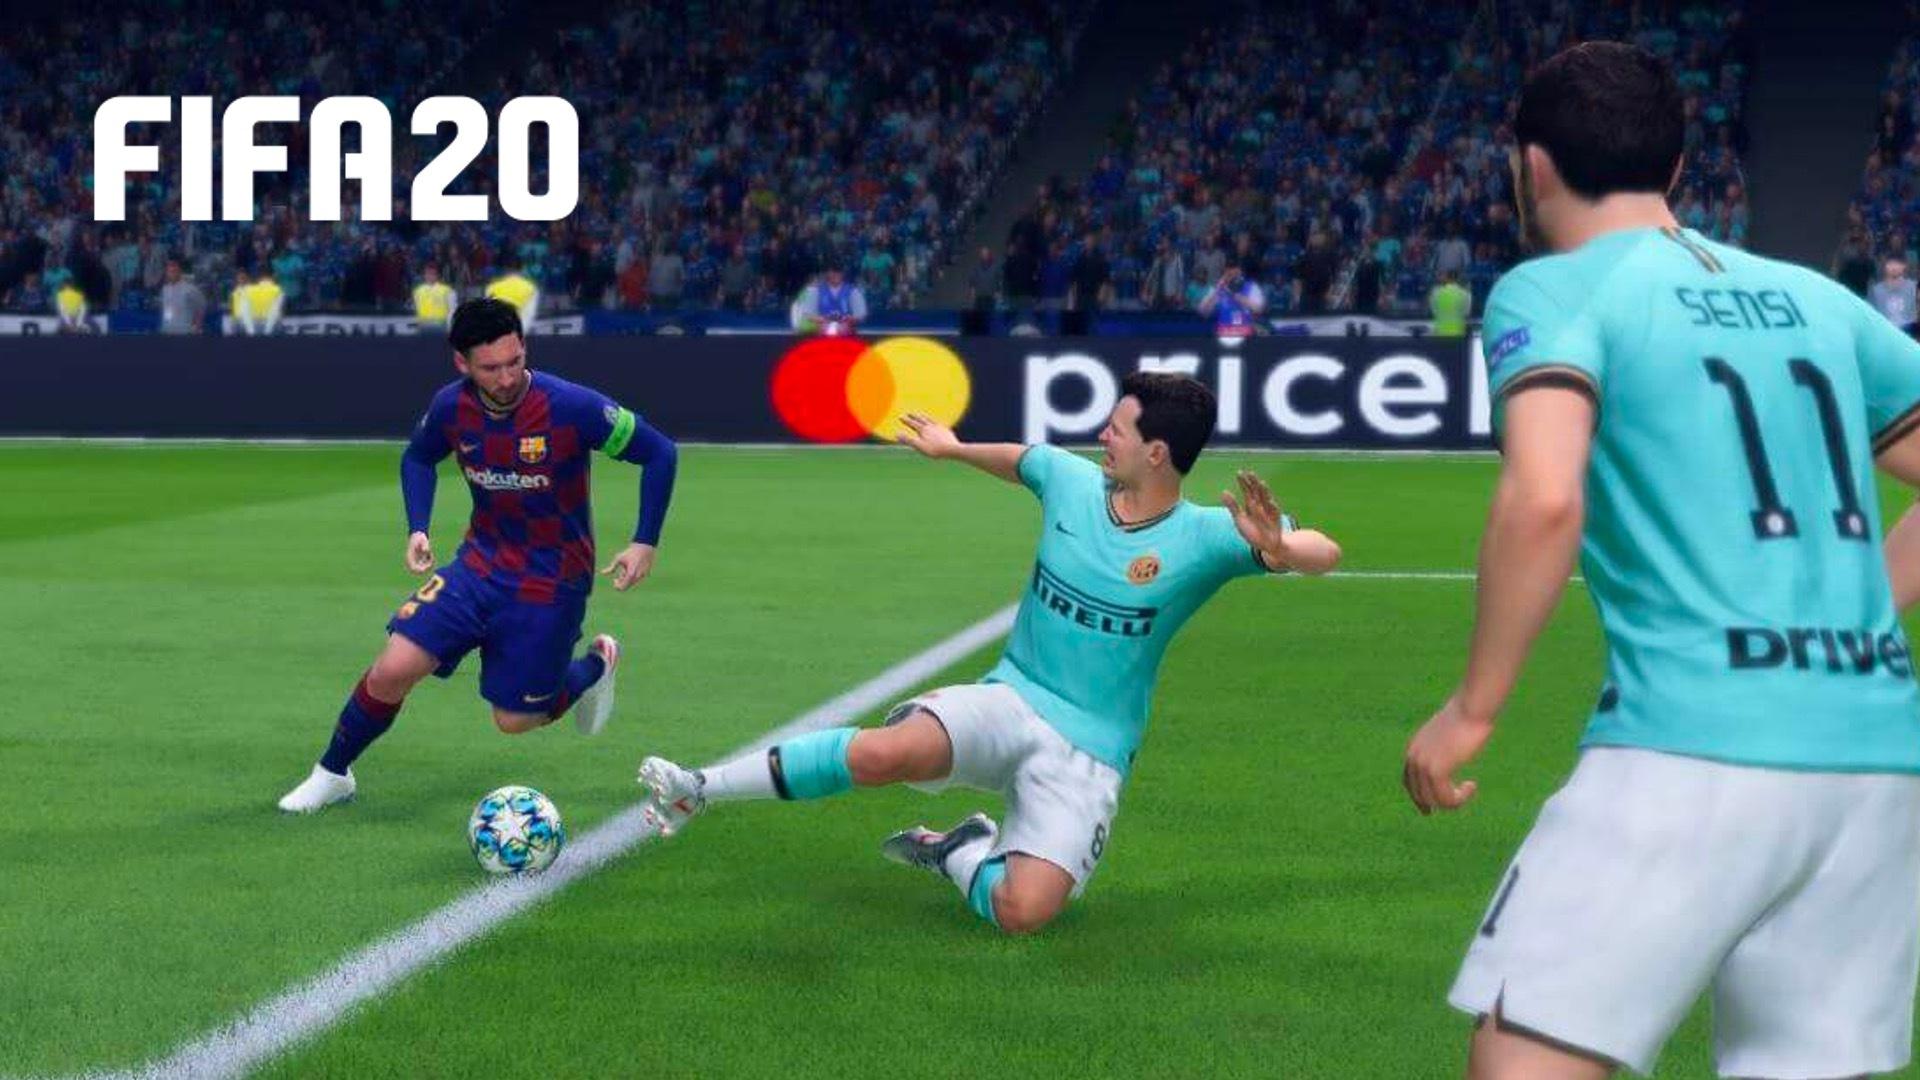 FIFA 20 player slide tackling Lionel Messi